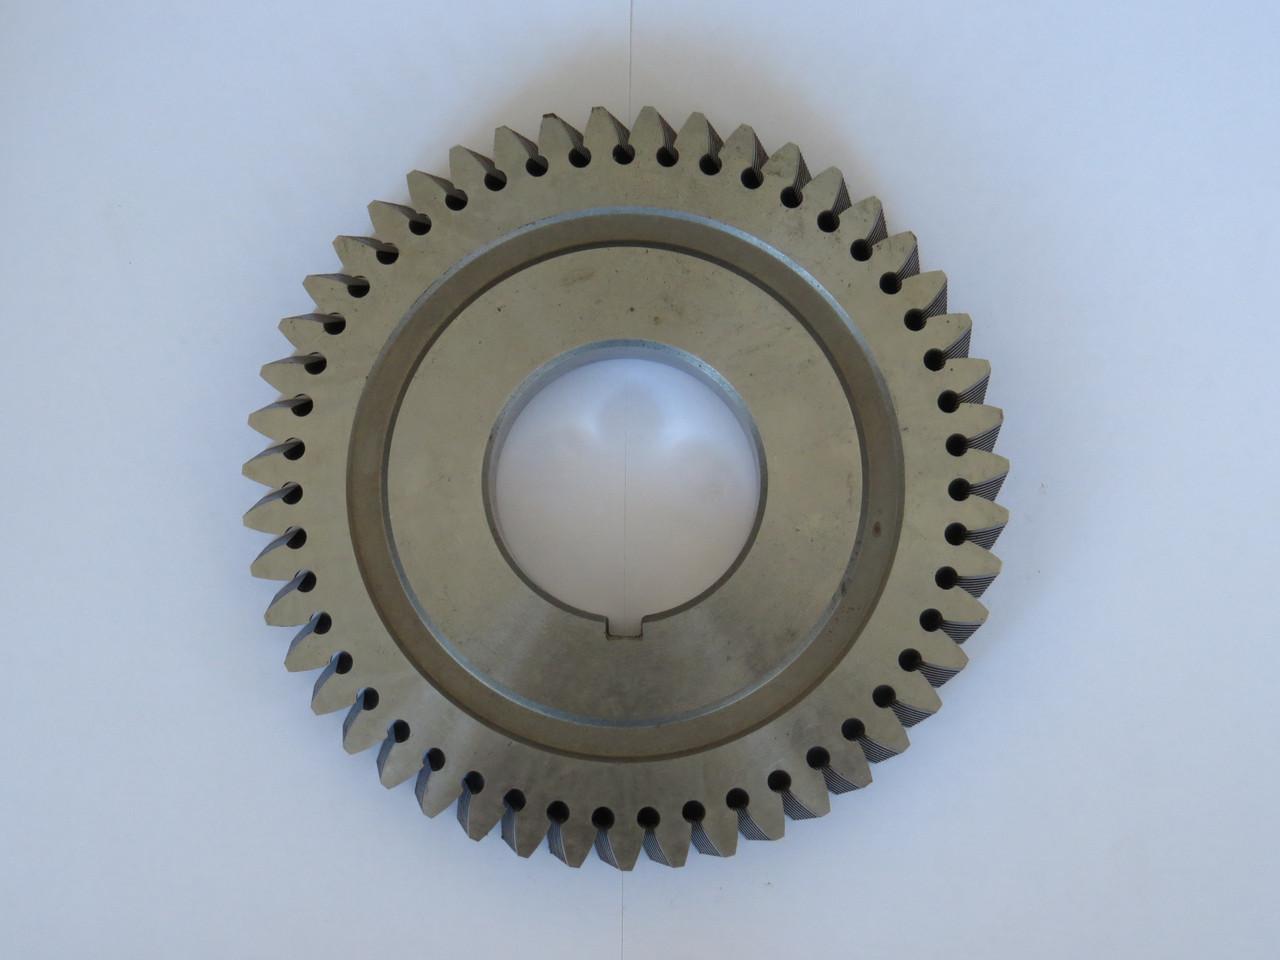 Шевер дисковый М2.0 Ø180 Z-83 градус 20* β5* Тип B Р18 ГОСТ8570-80